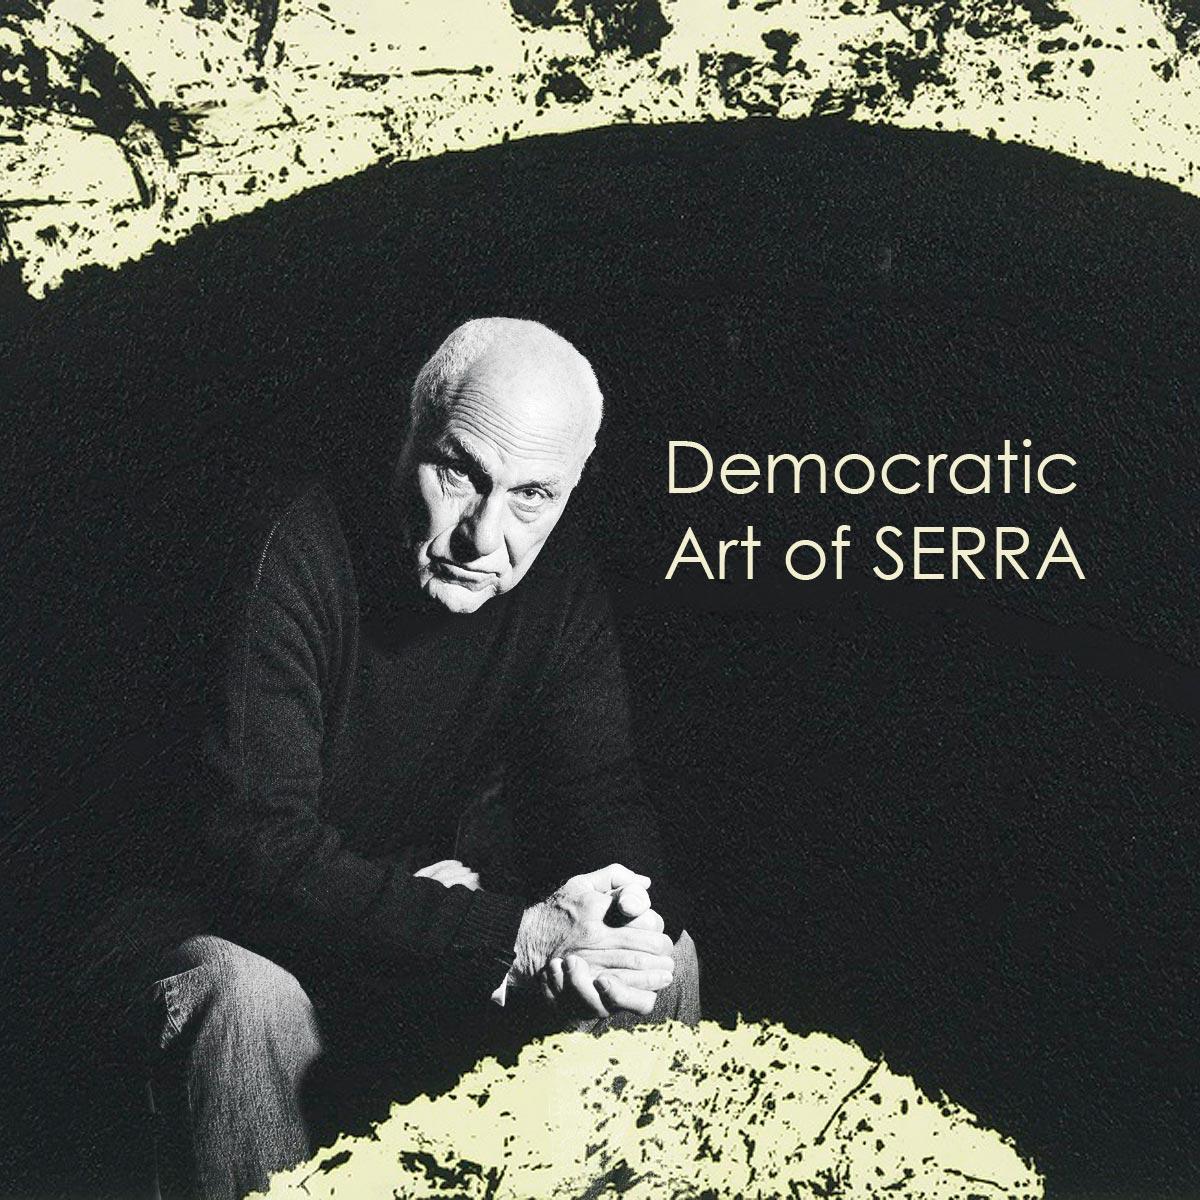 Democratic Art of RICHARD SERRA  Democratic is a word rarely applied to contemporary art and especially minimalism. However with Serra it is true.  VIEW LOTS: http://0515.phiauctions.com/  #RichardSerra #Serra #stayhome #buyartonline #artauction #onlineauction #phiauctions #minimalismpic.twitter.com/x9KRZfcdfH